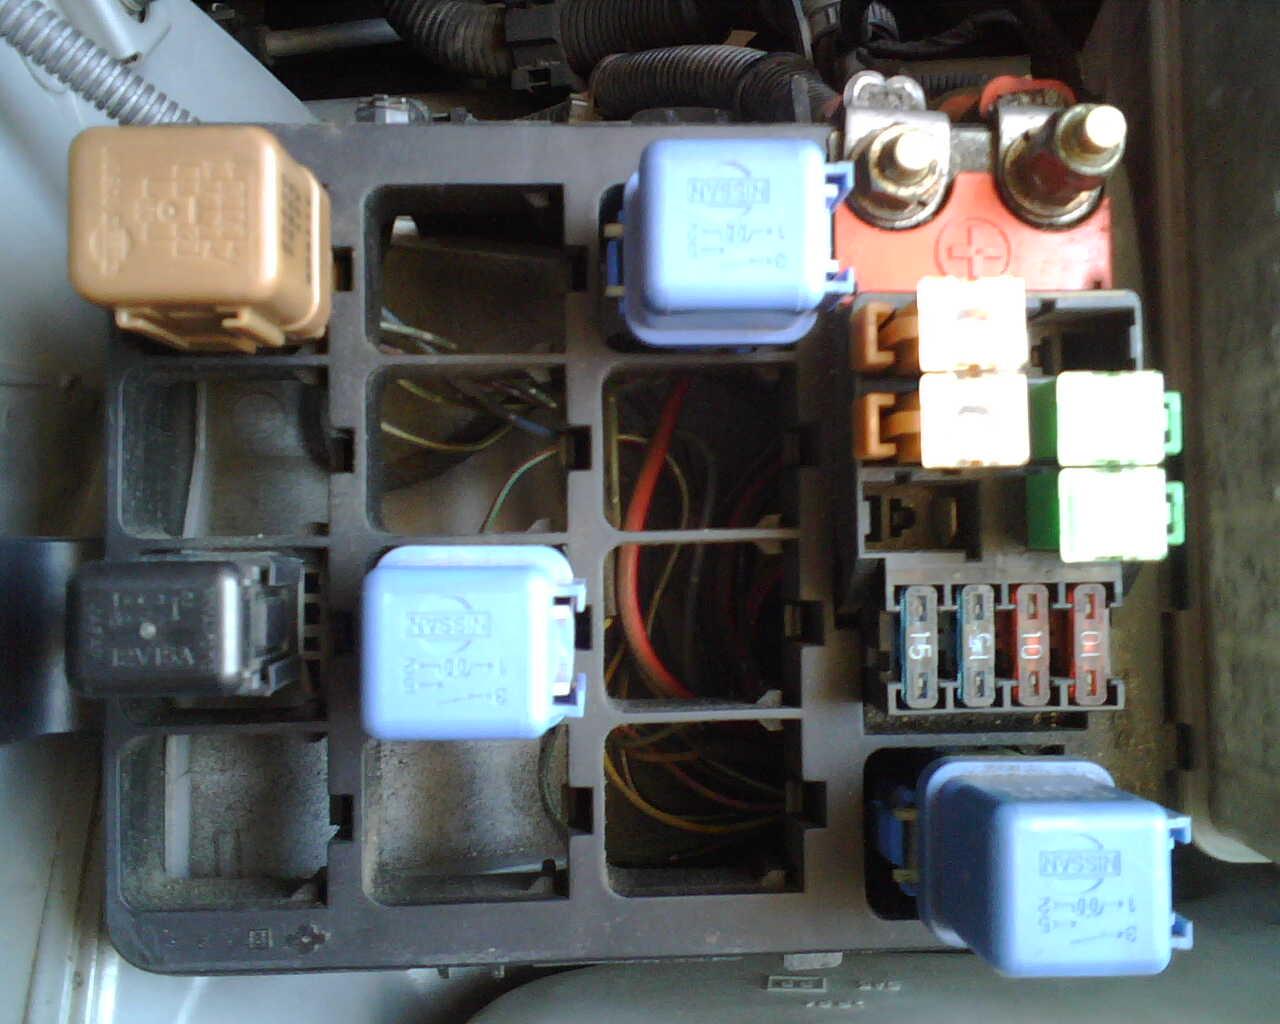 r33 gtst ecu wiring diagram software architecture visio fuse box data electrical